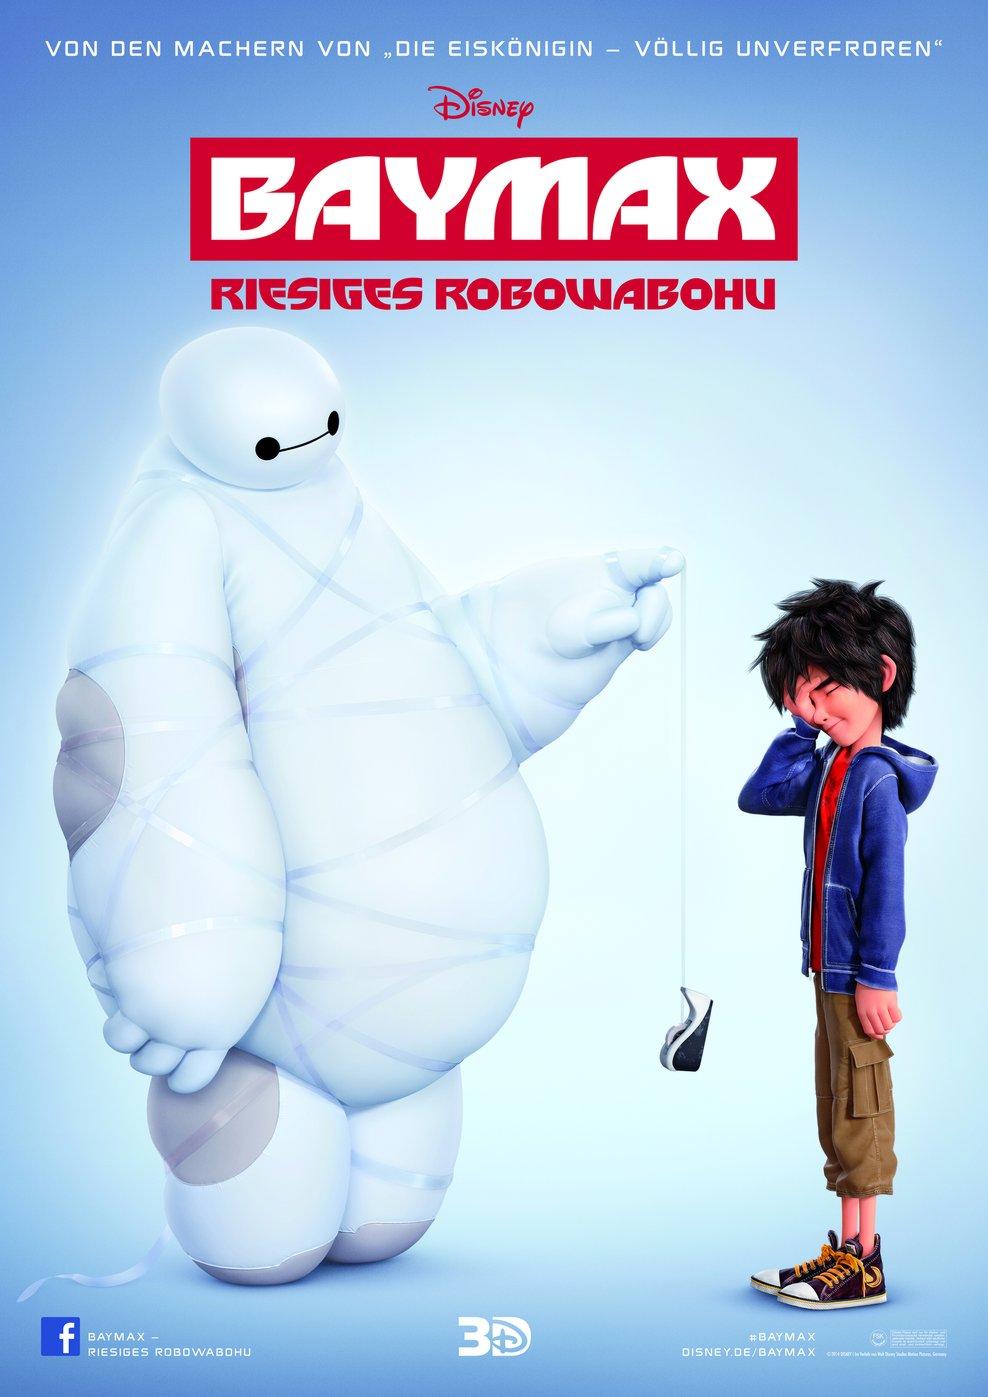 Baymax - Riesiges Robowabohu (Poster)